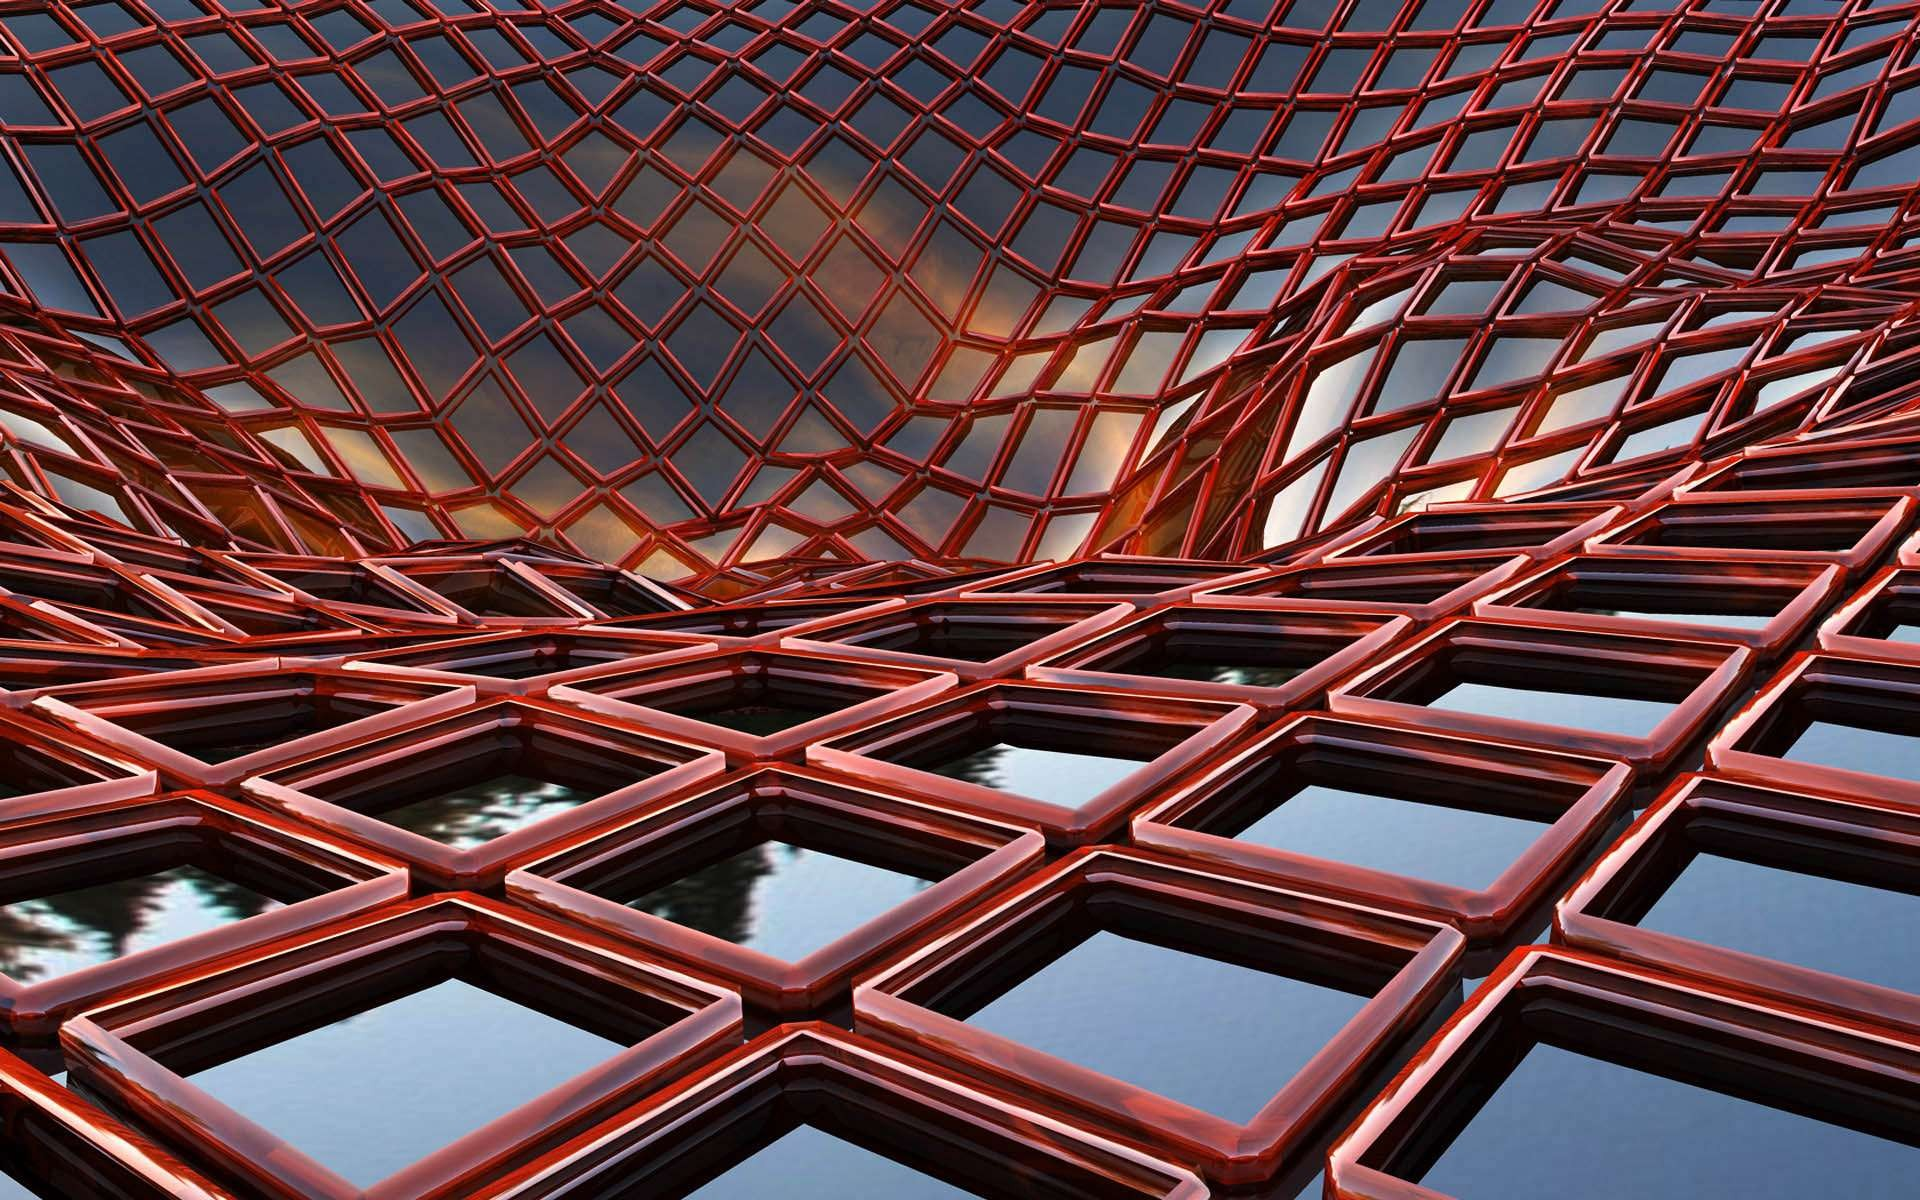 Fondos de pantalla Textura en 3D